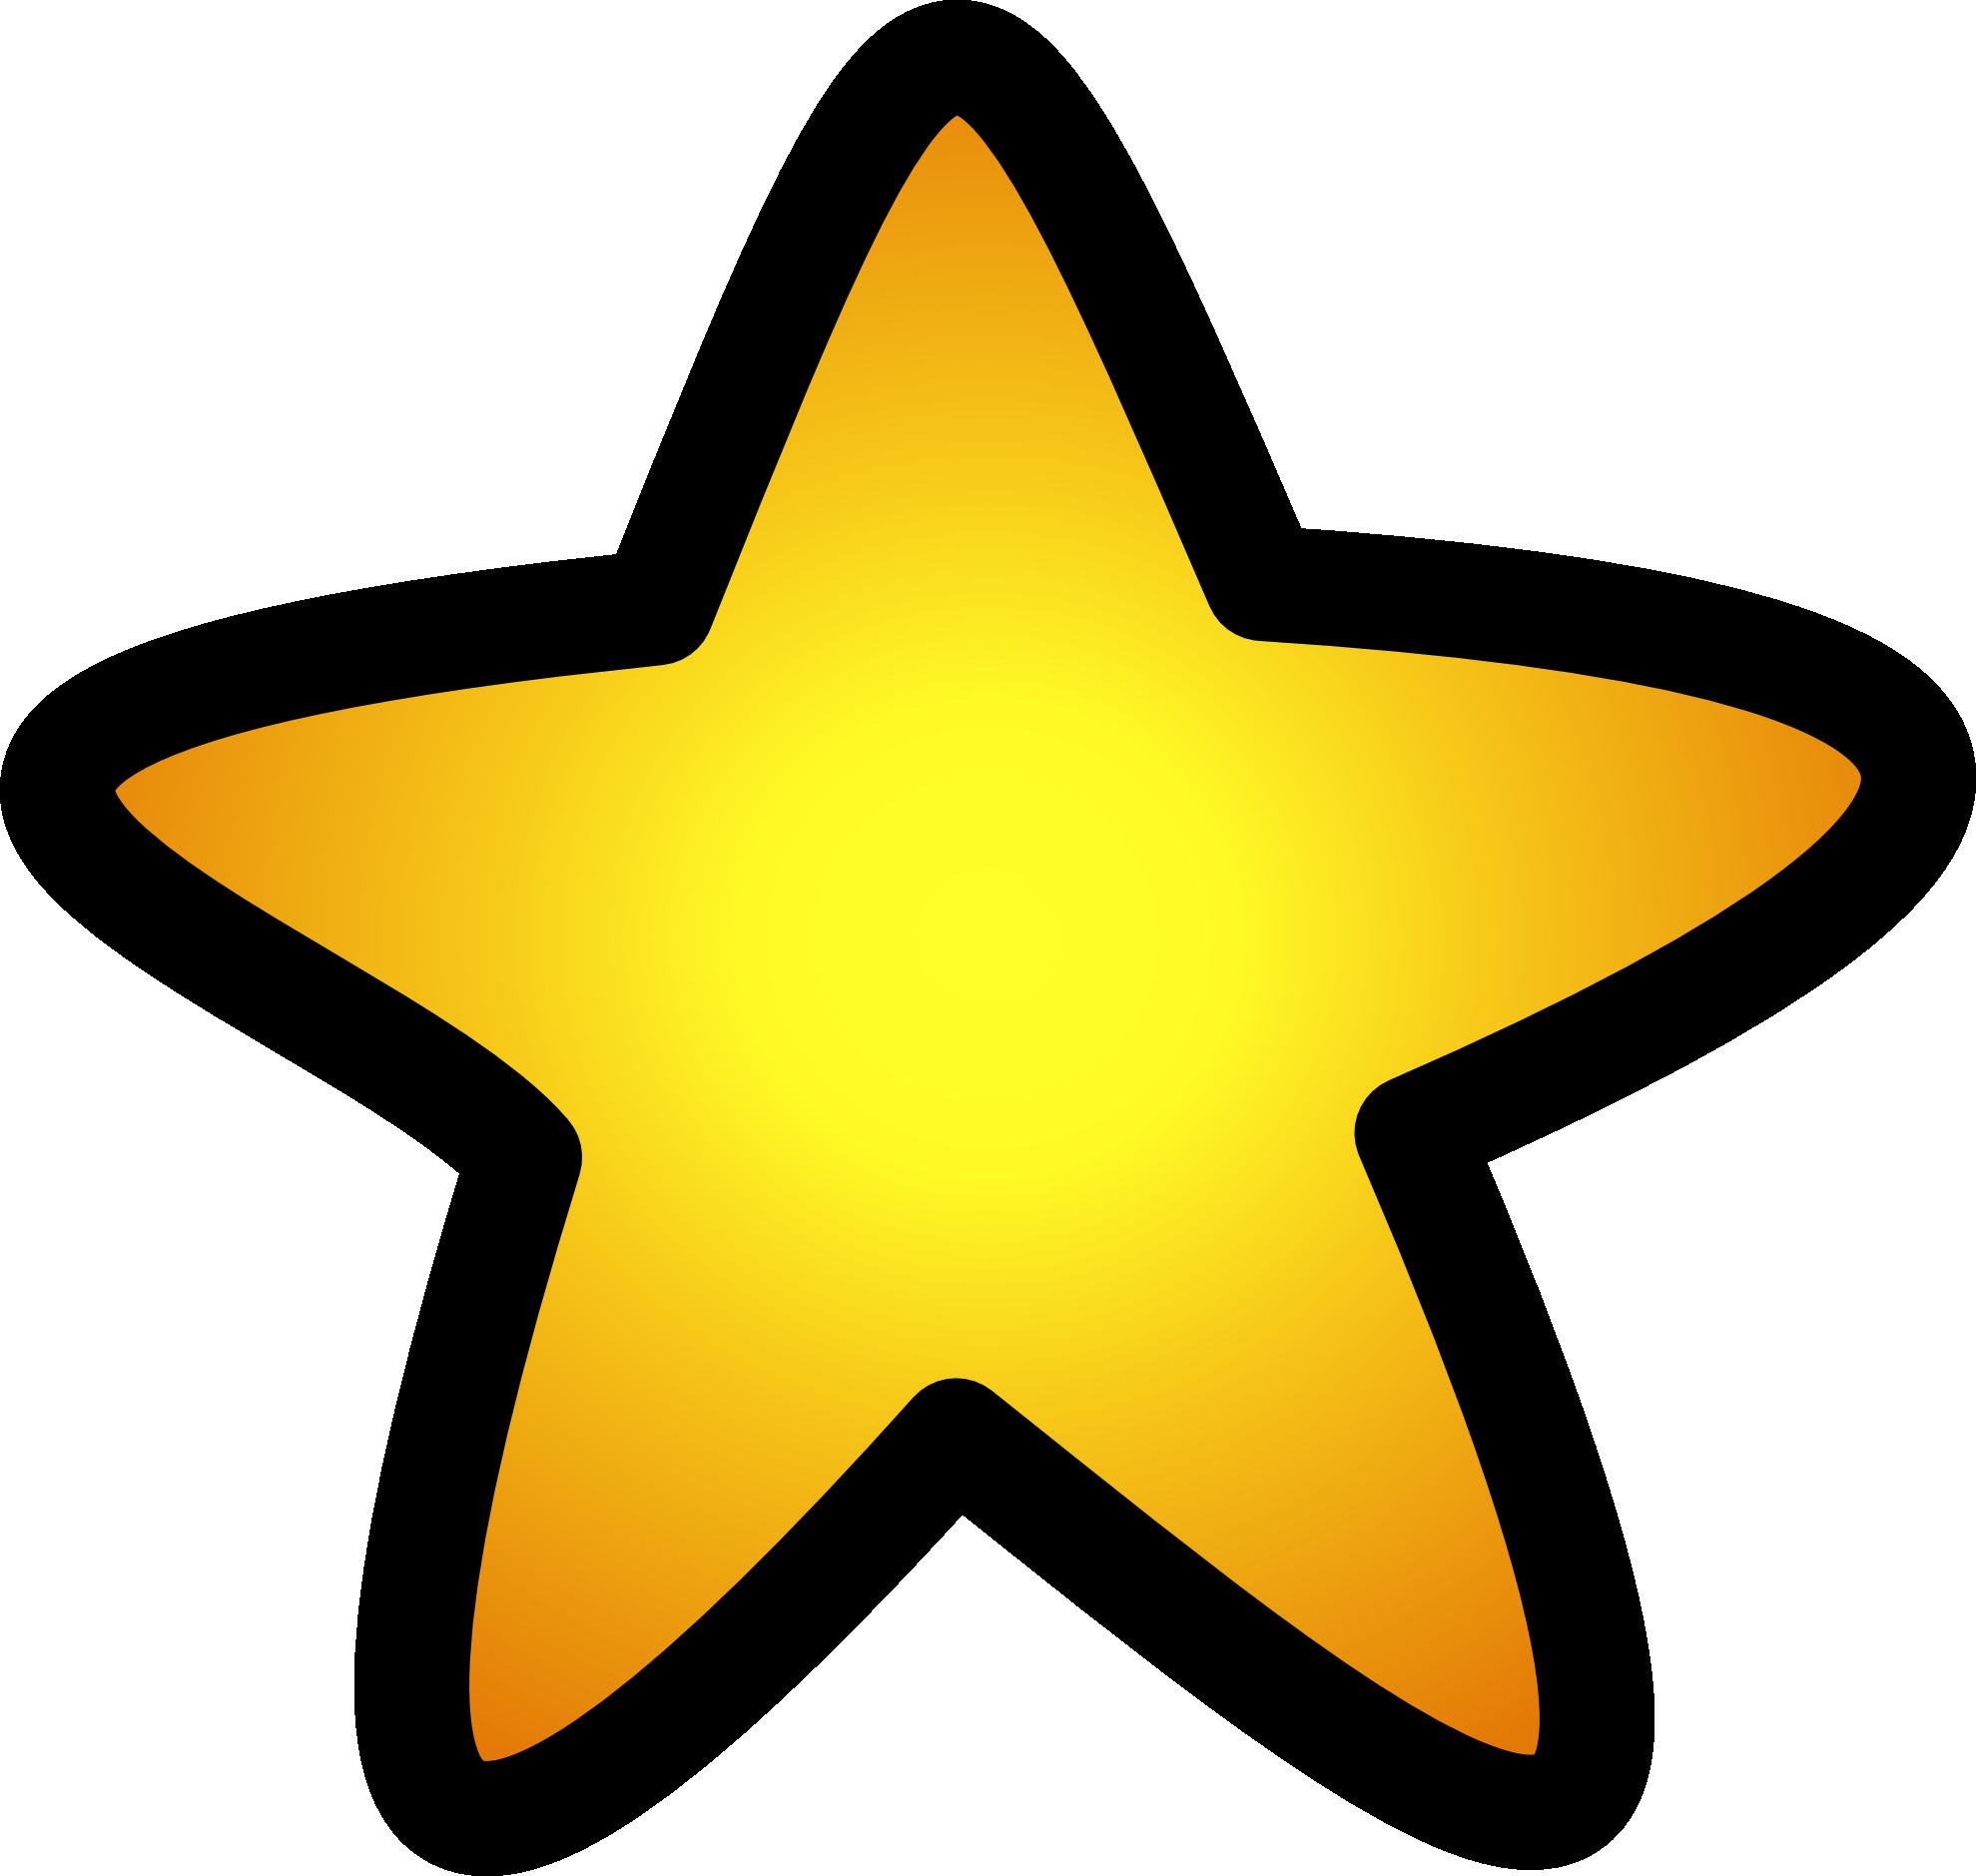 gold star clipart clipart panda free clipart images rh clipartpanda com all star baseball clipart all star sports clipart